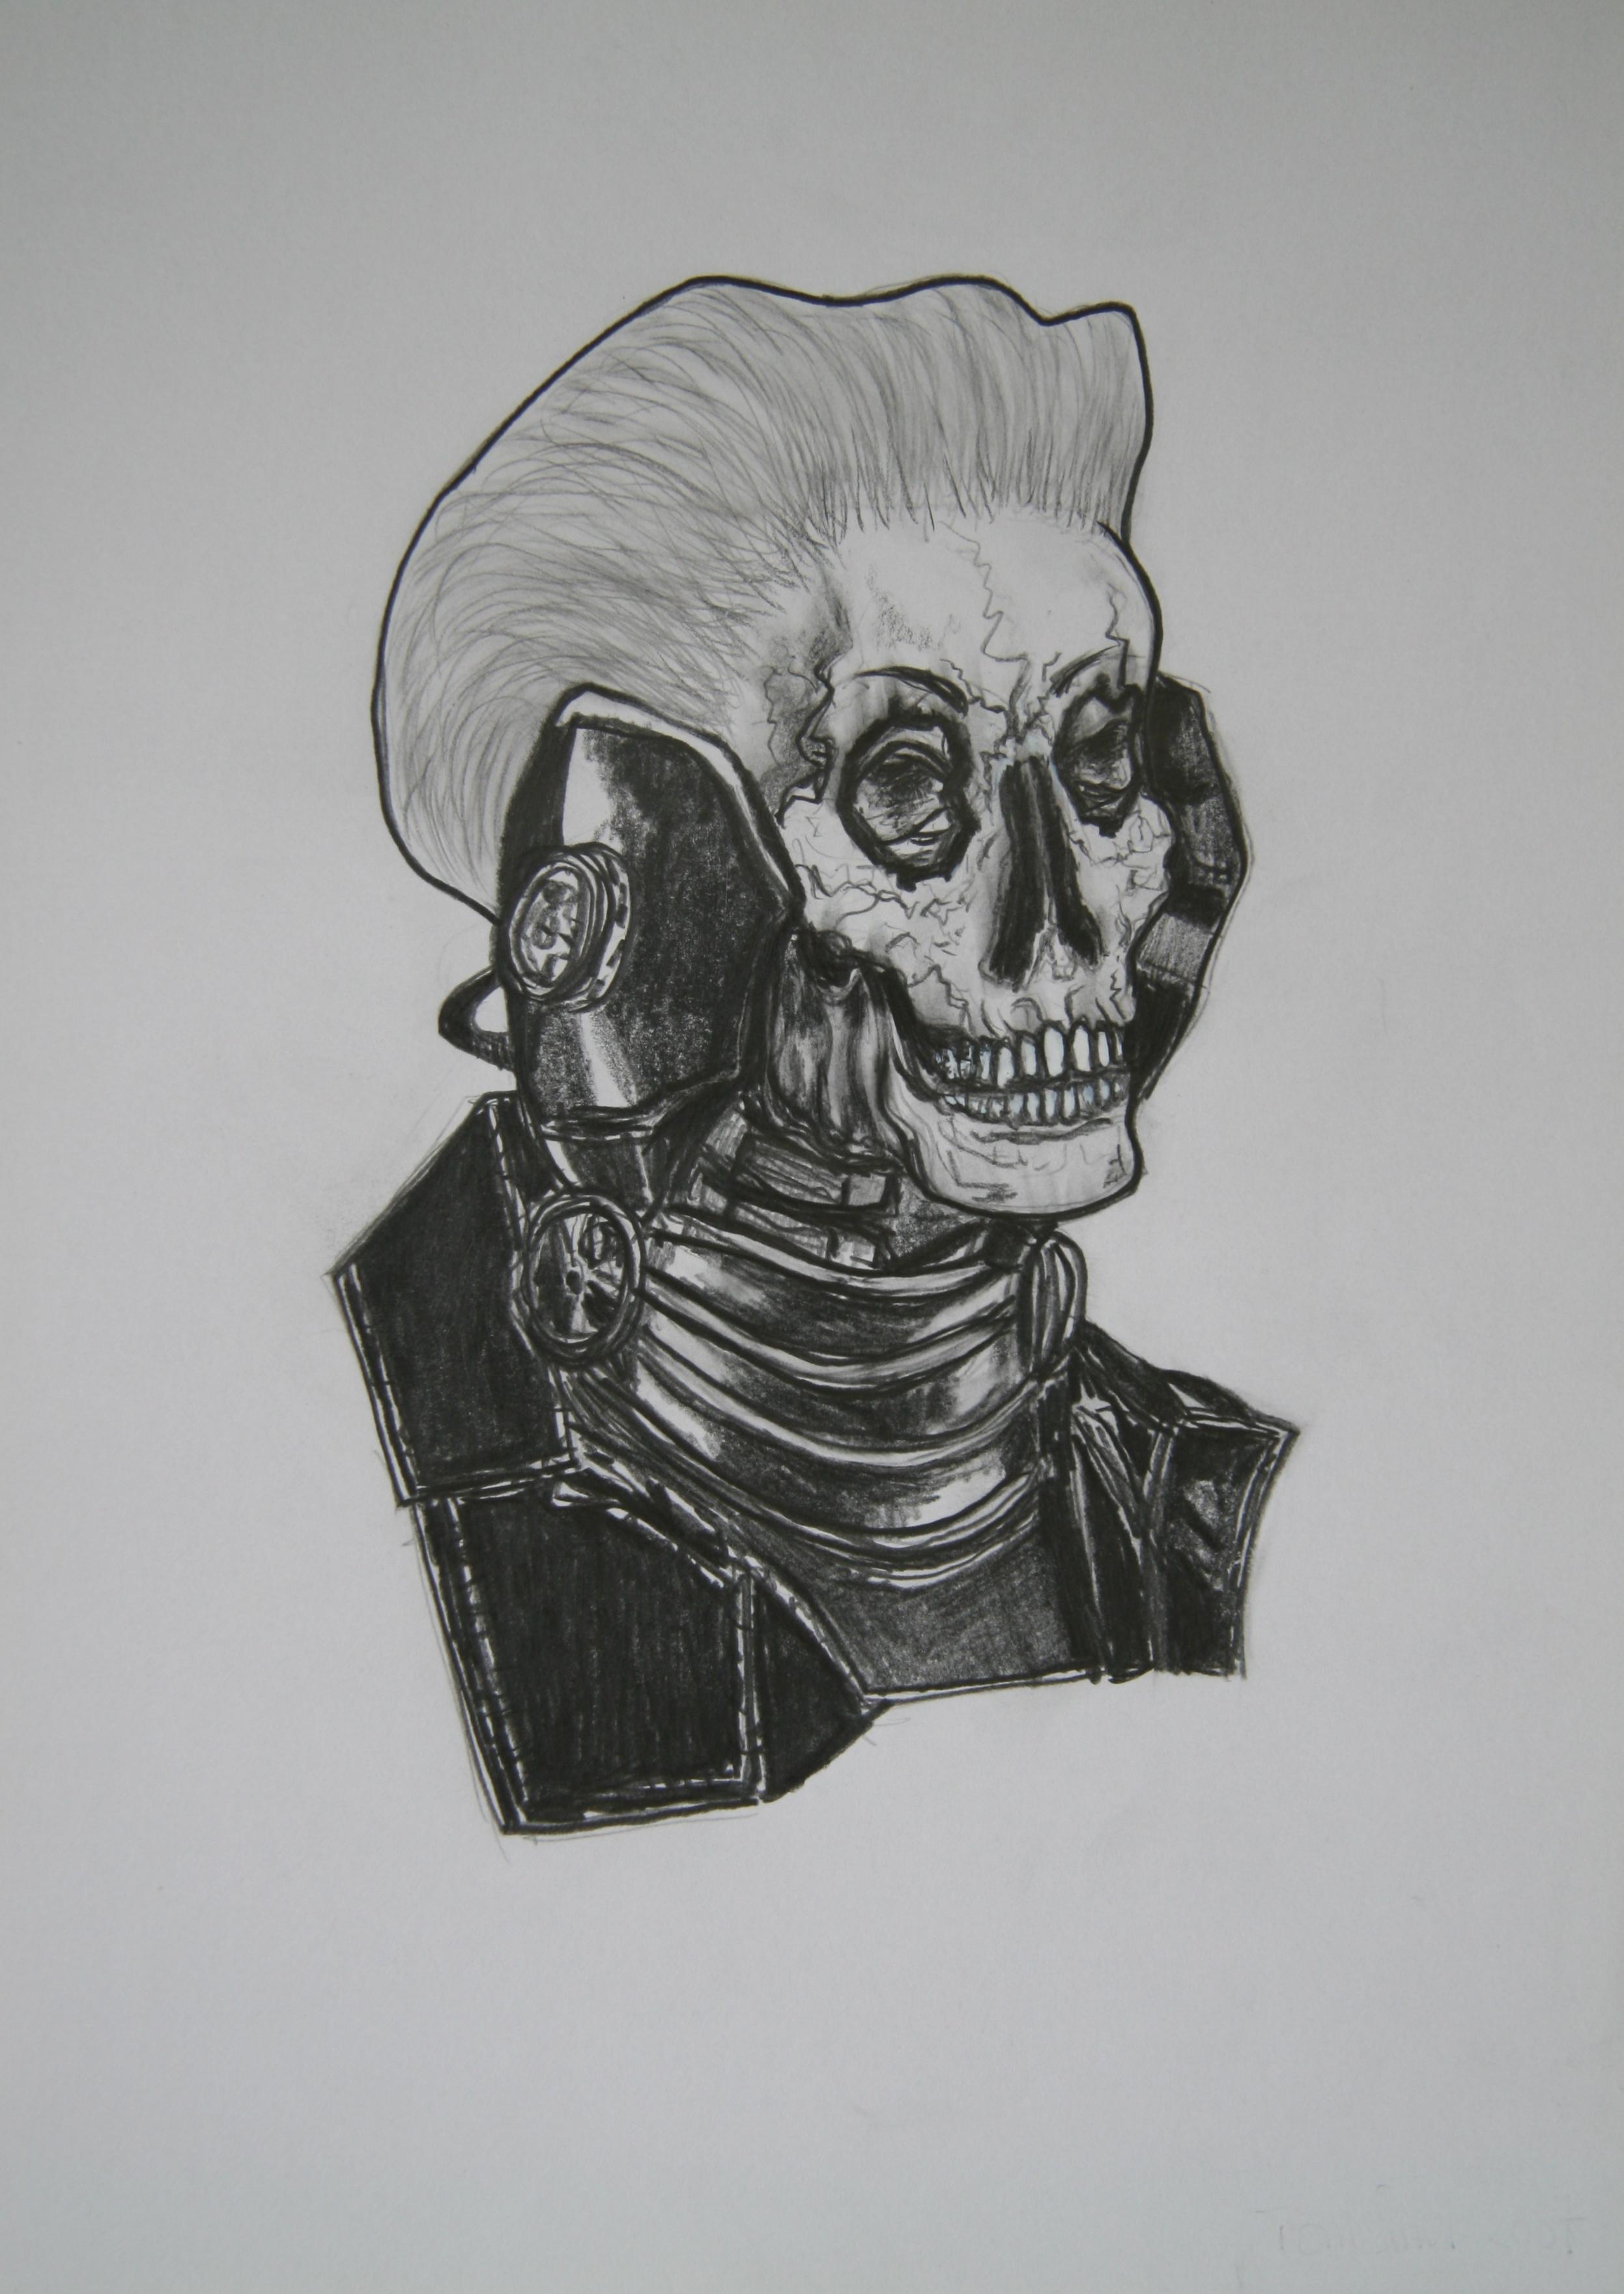 Skull 6, 30x21cm, pencil on paper